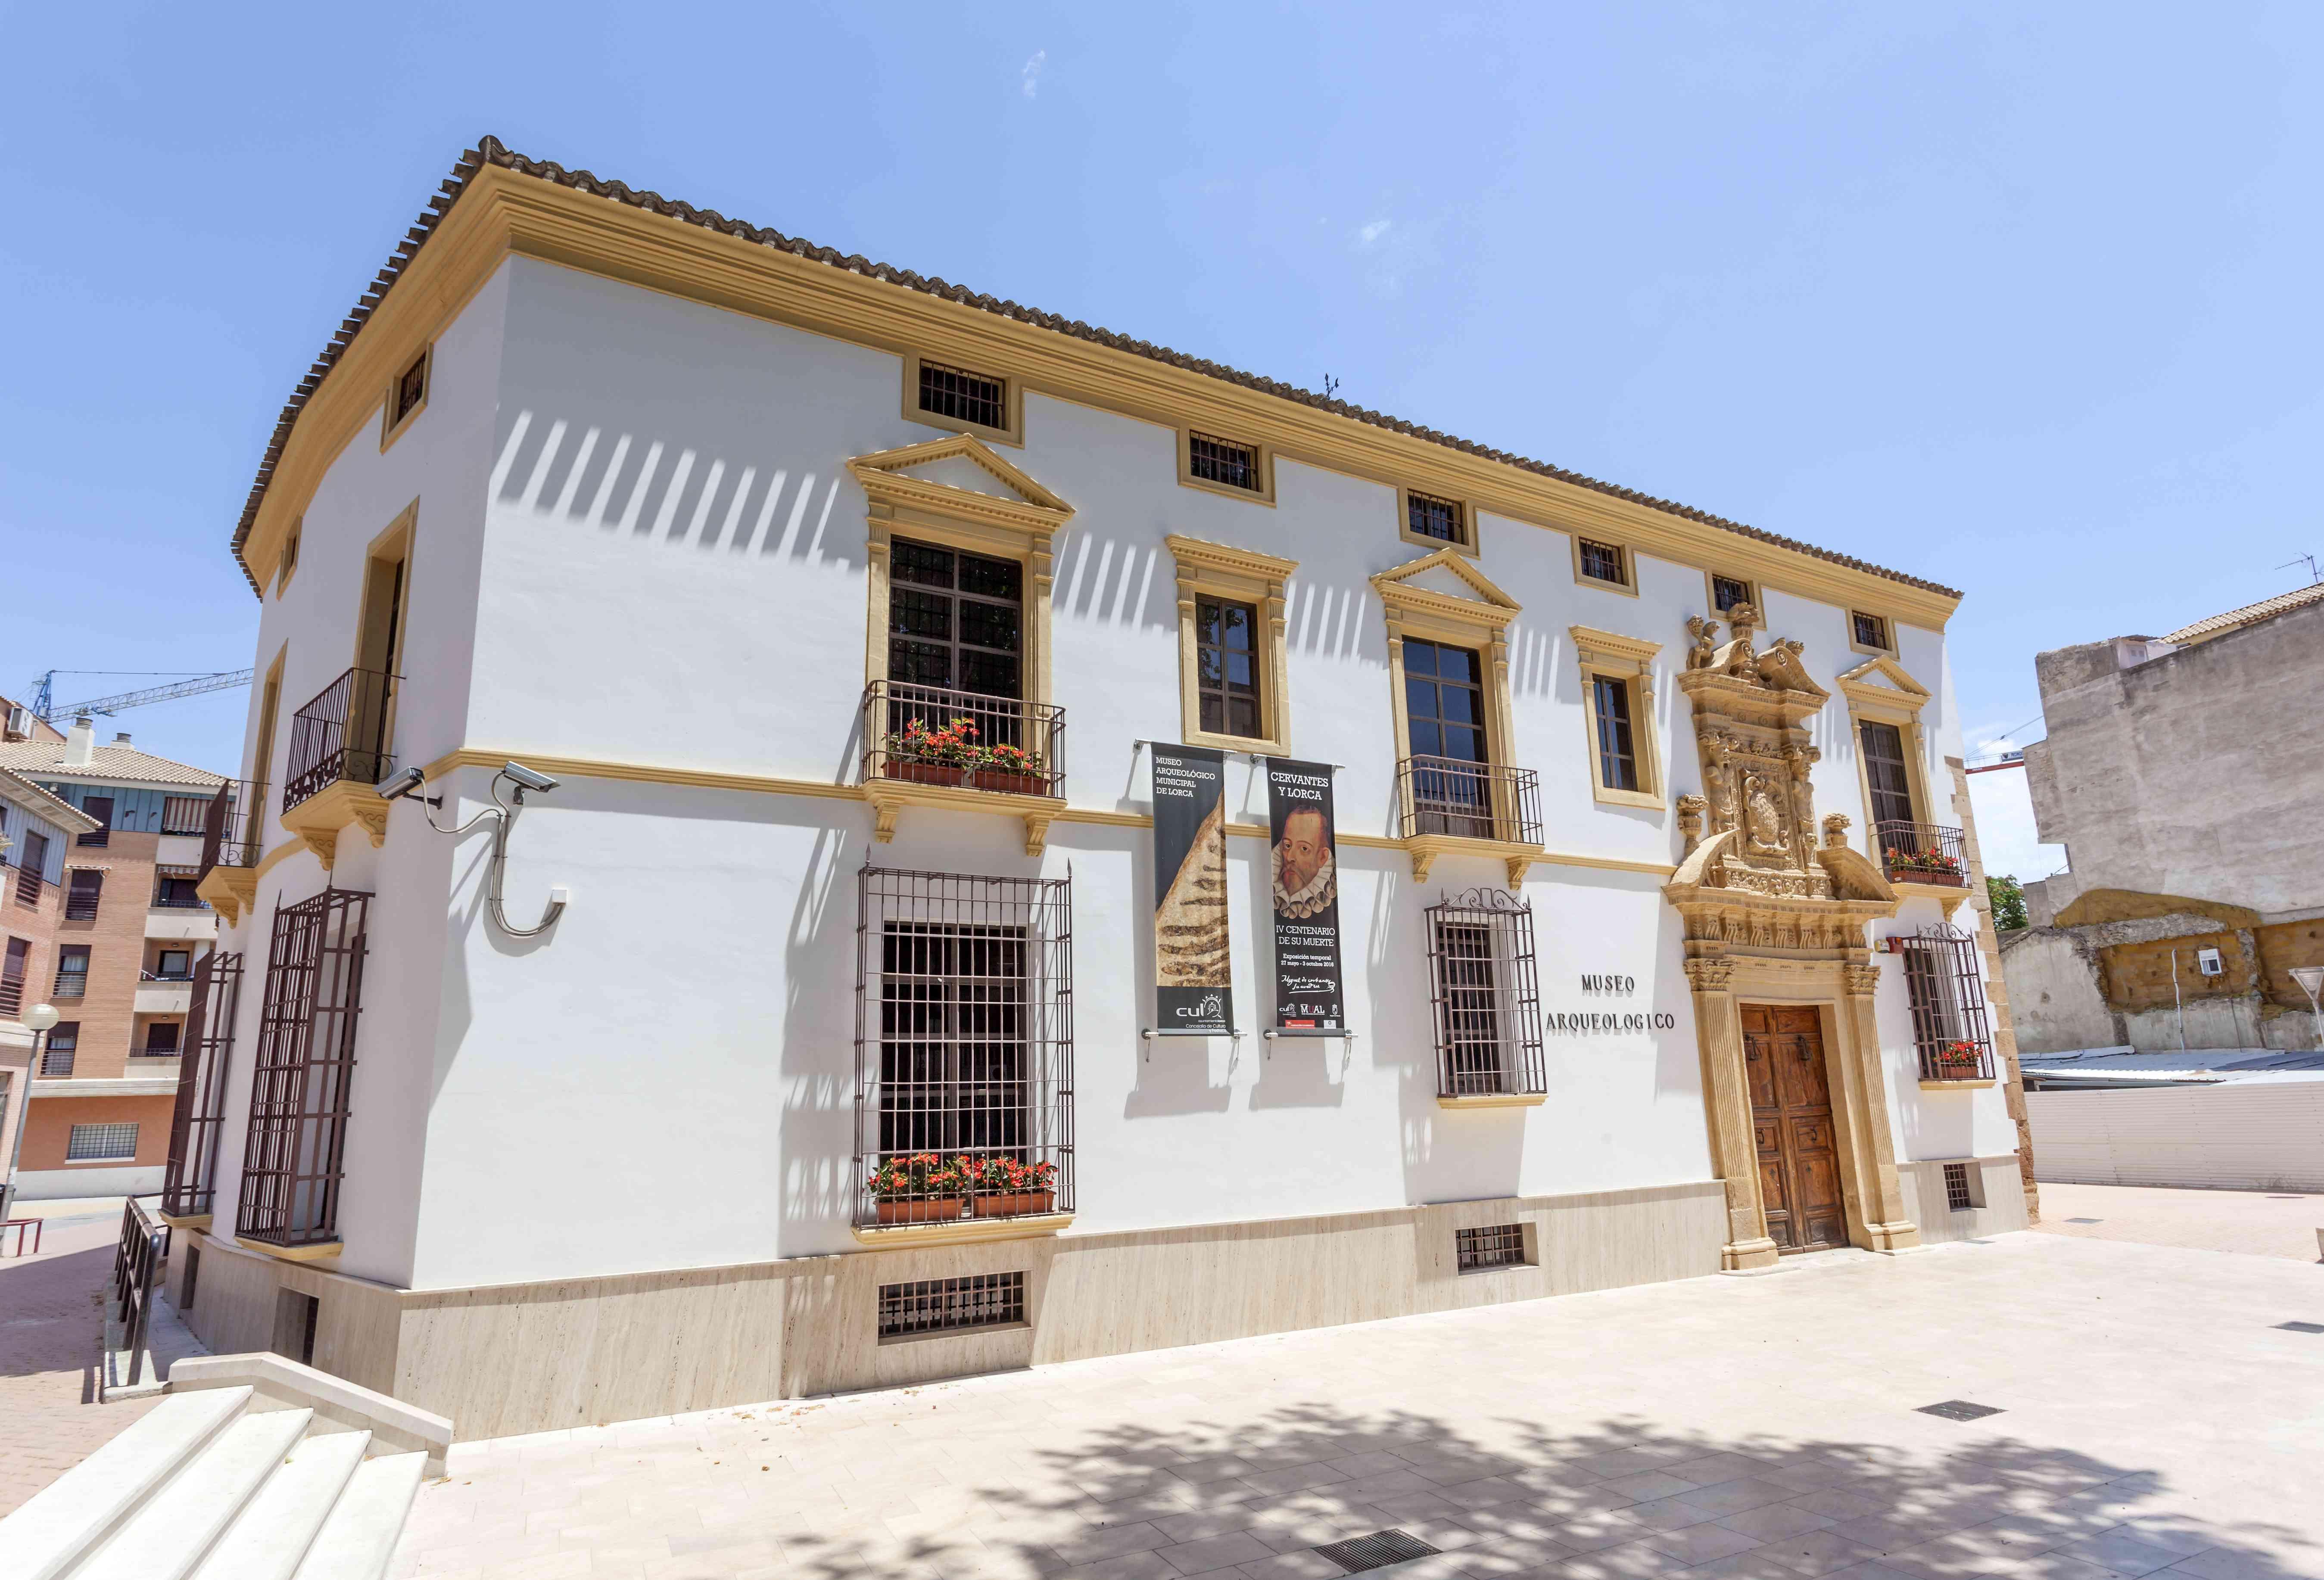 Archeological museum in Lorca, Spain